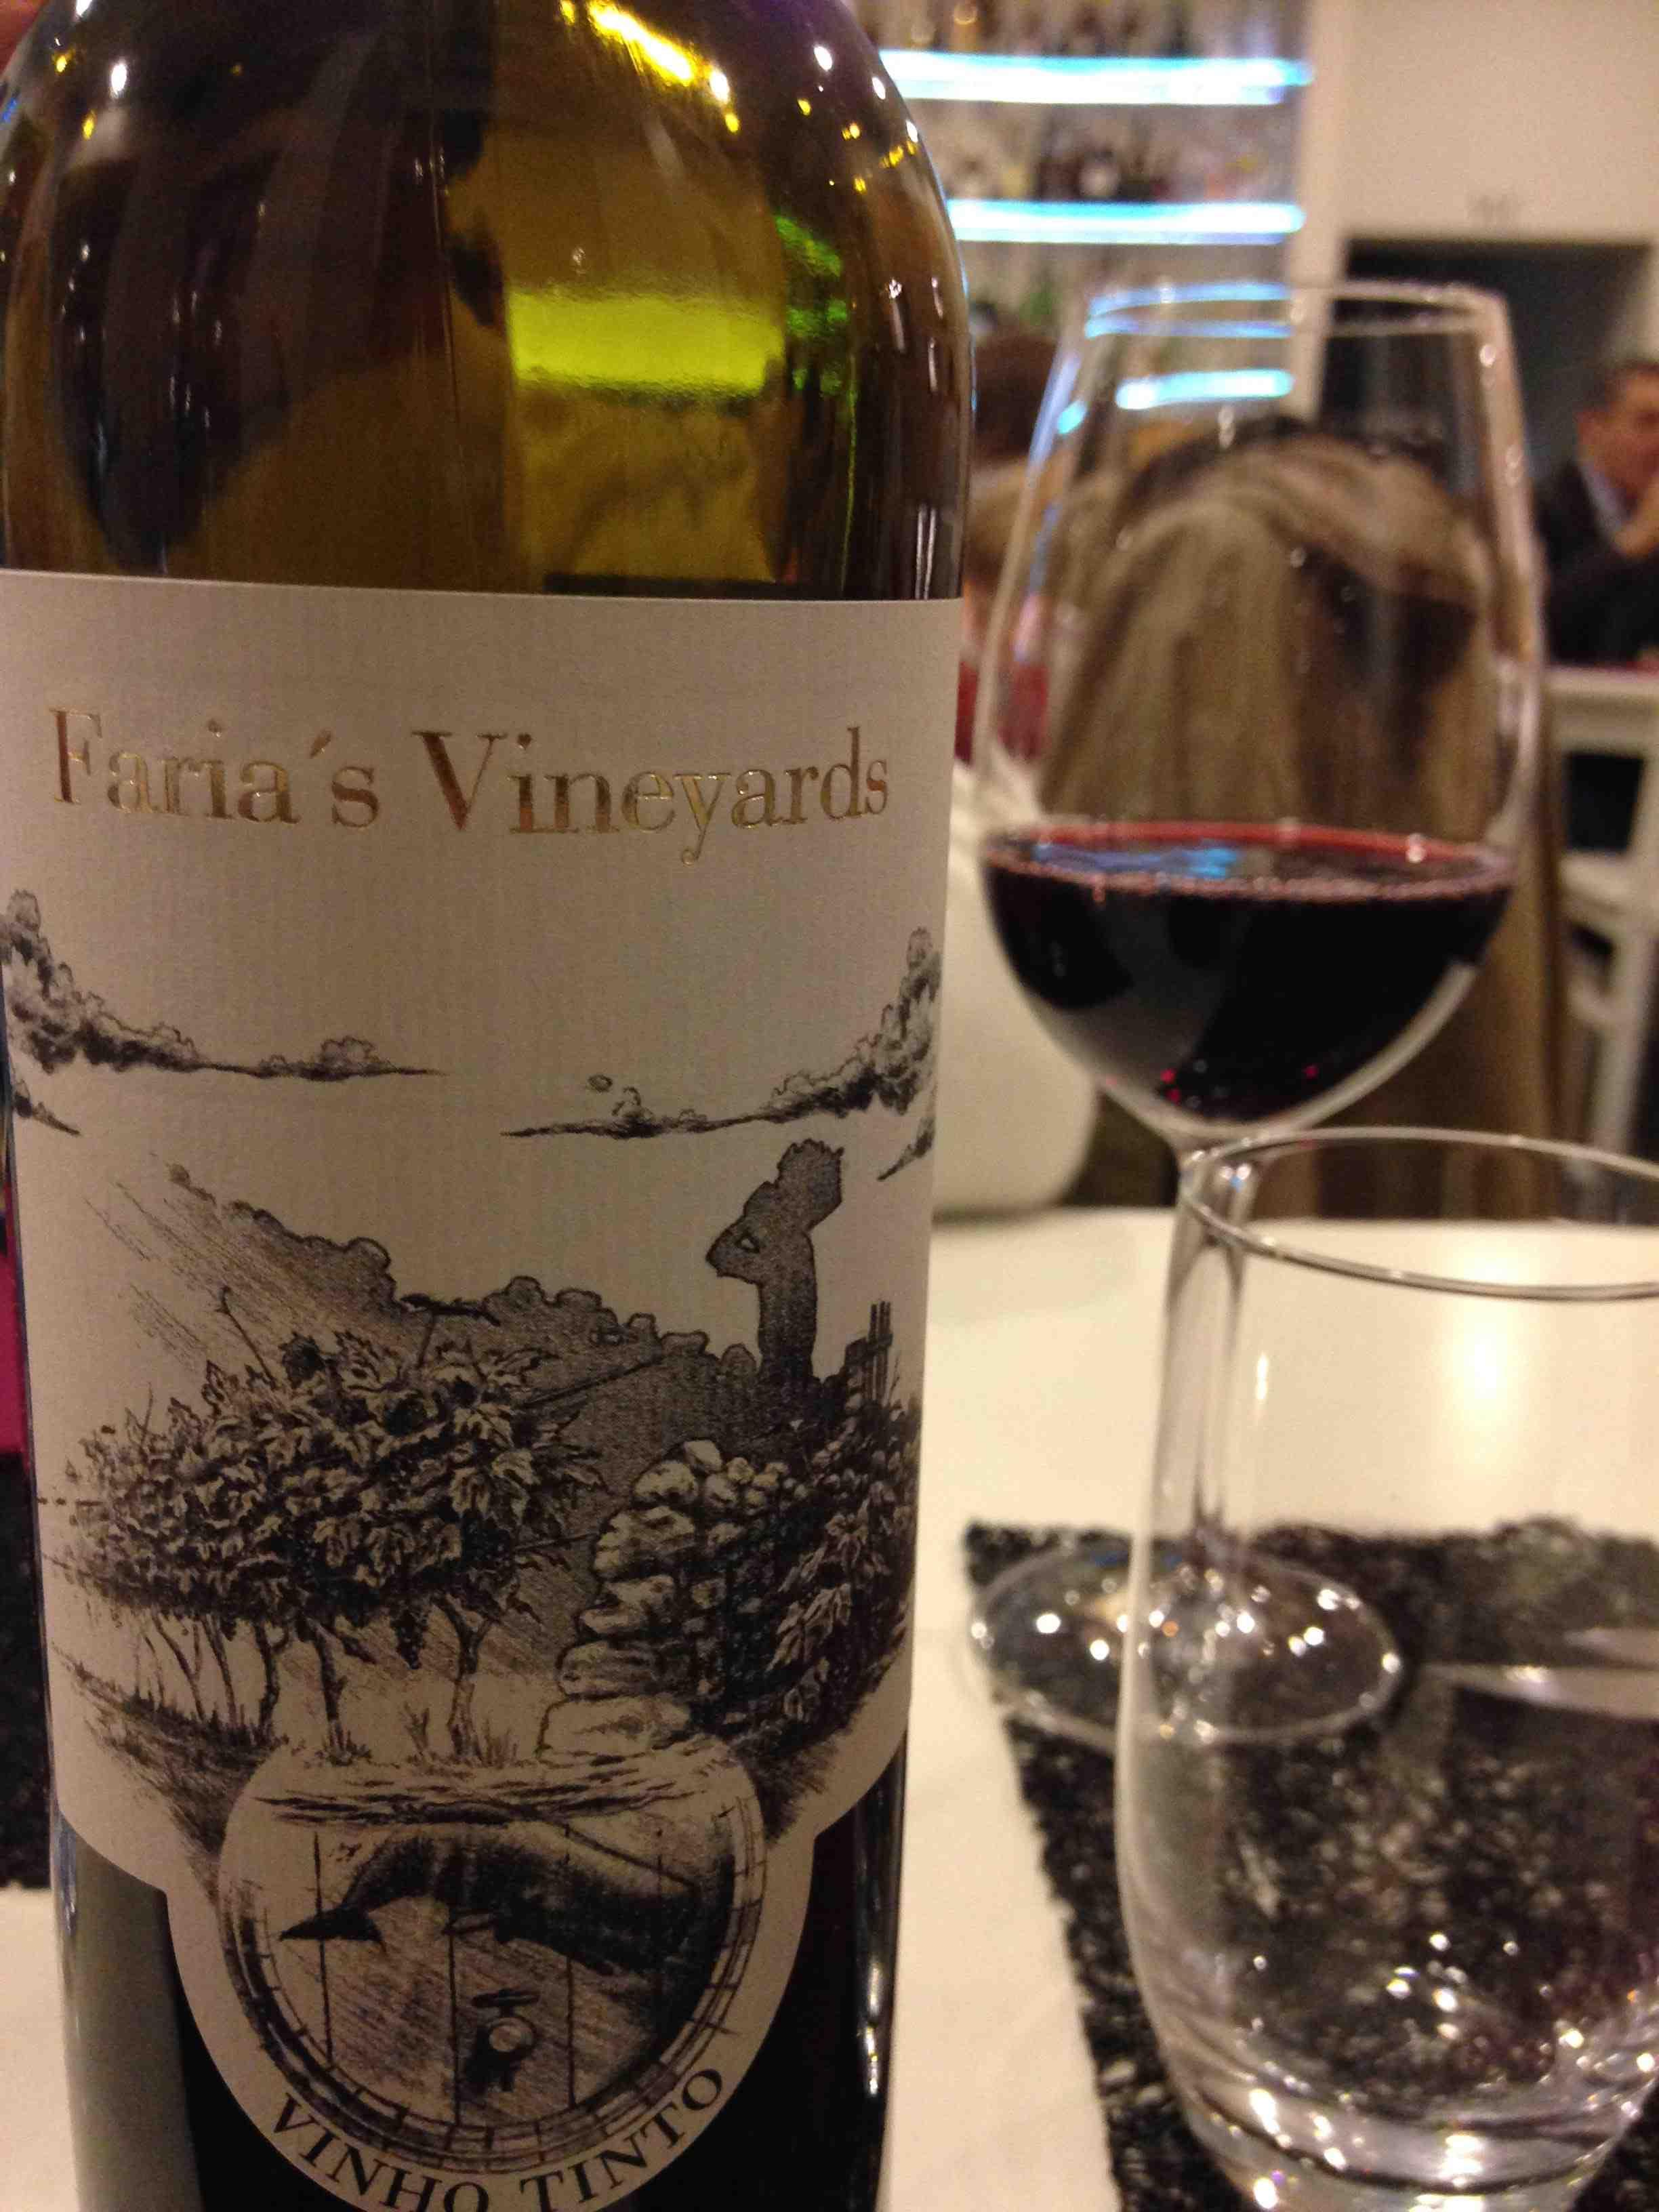 faria's vineyards